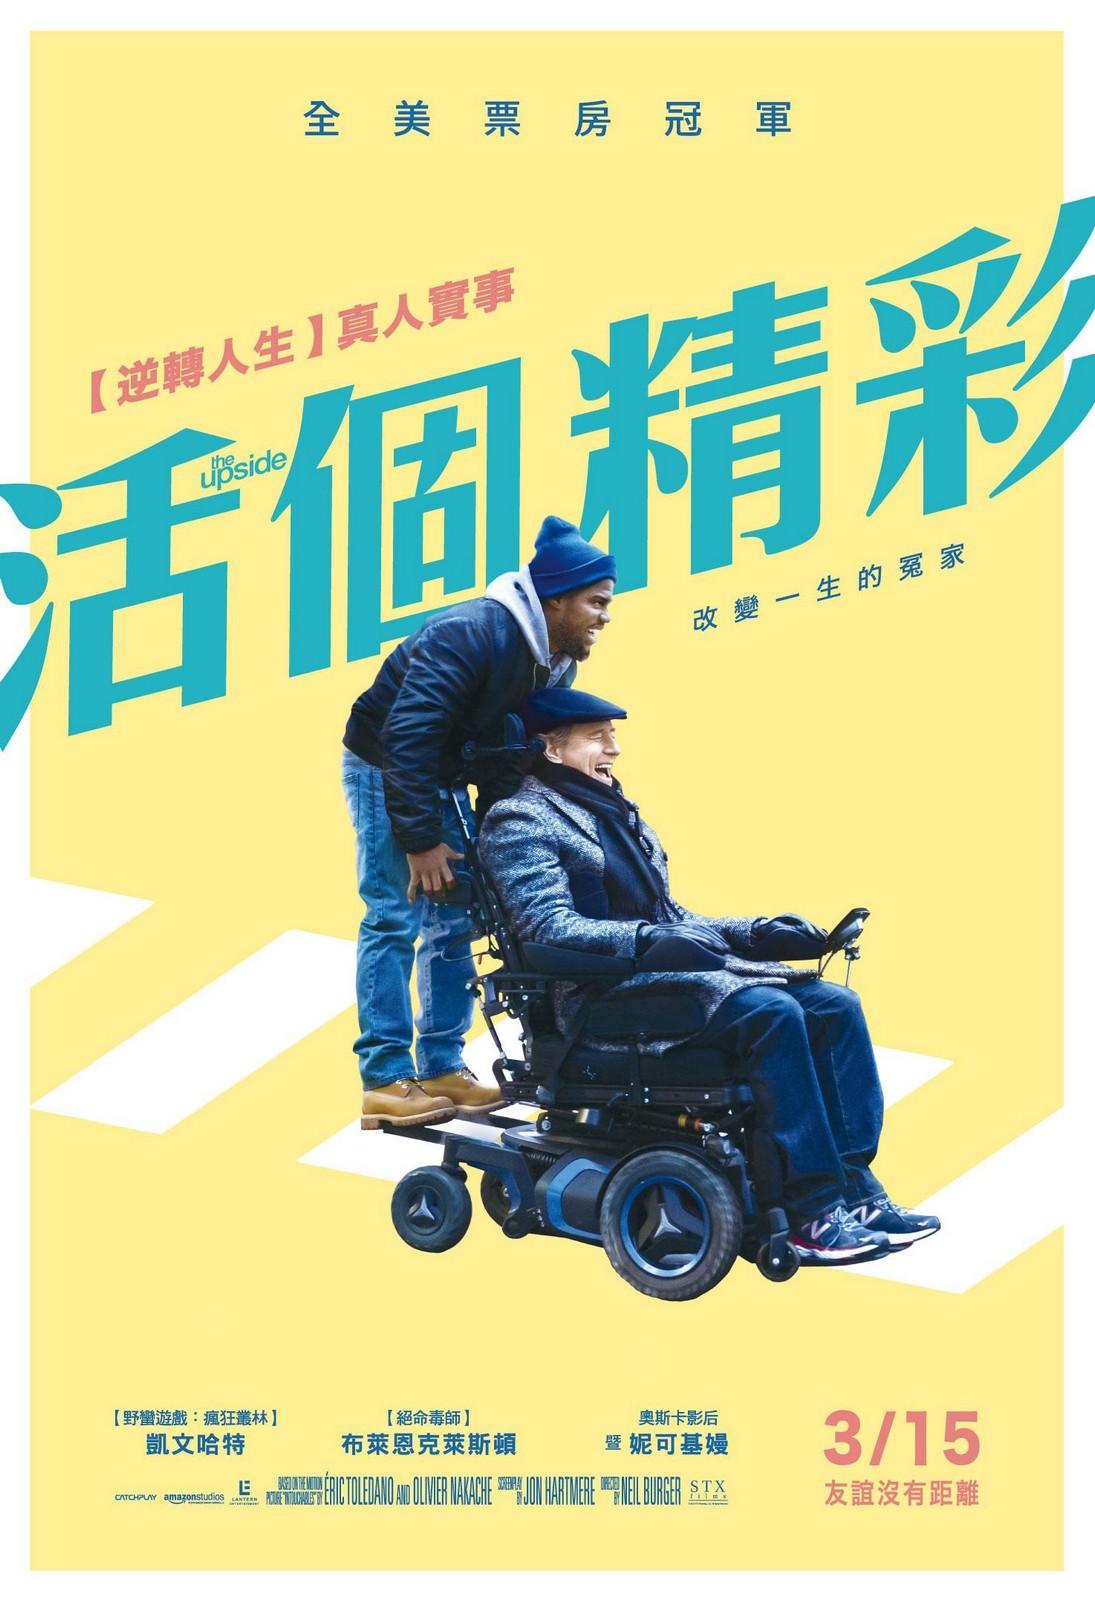 Movie, The Upside(美國, 2017年) / 活個精彩(台灣) / 閃亮人生(香港) / 触不可及(網路), 電影海報, 台灣